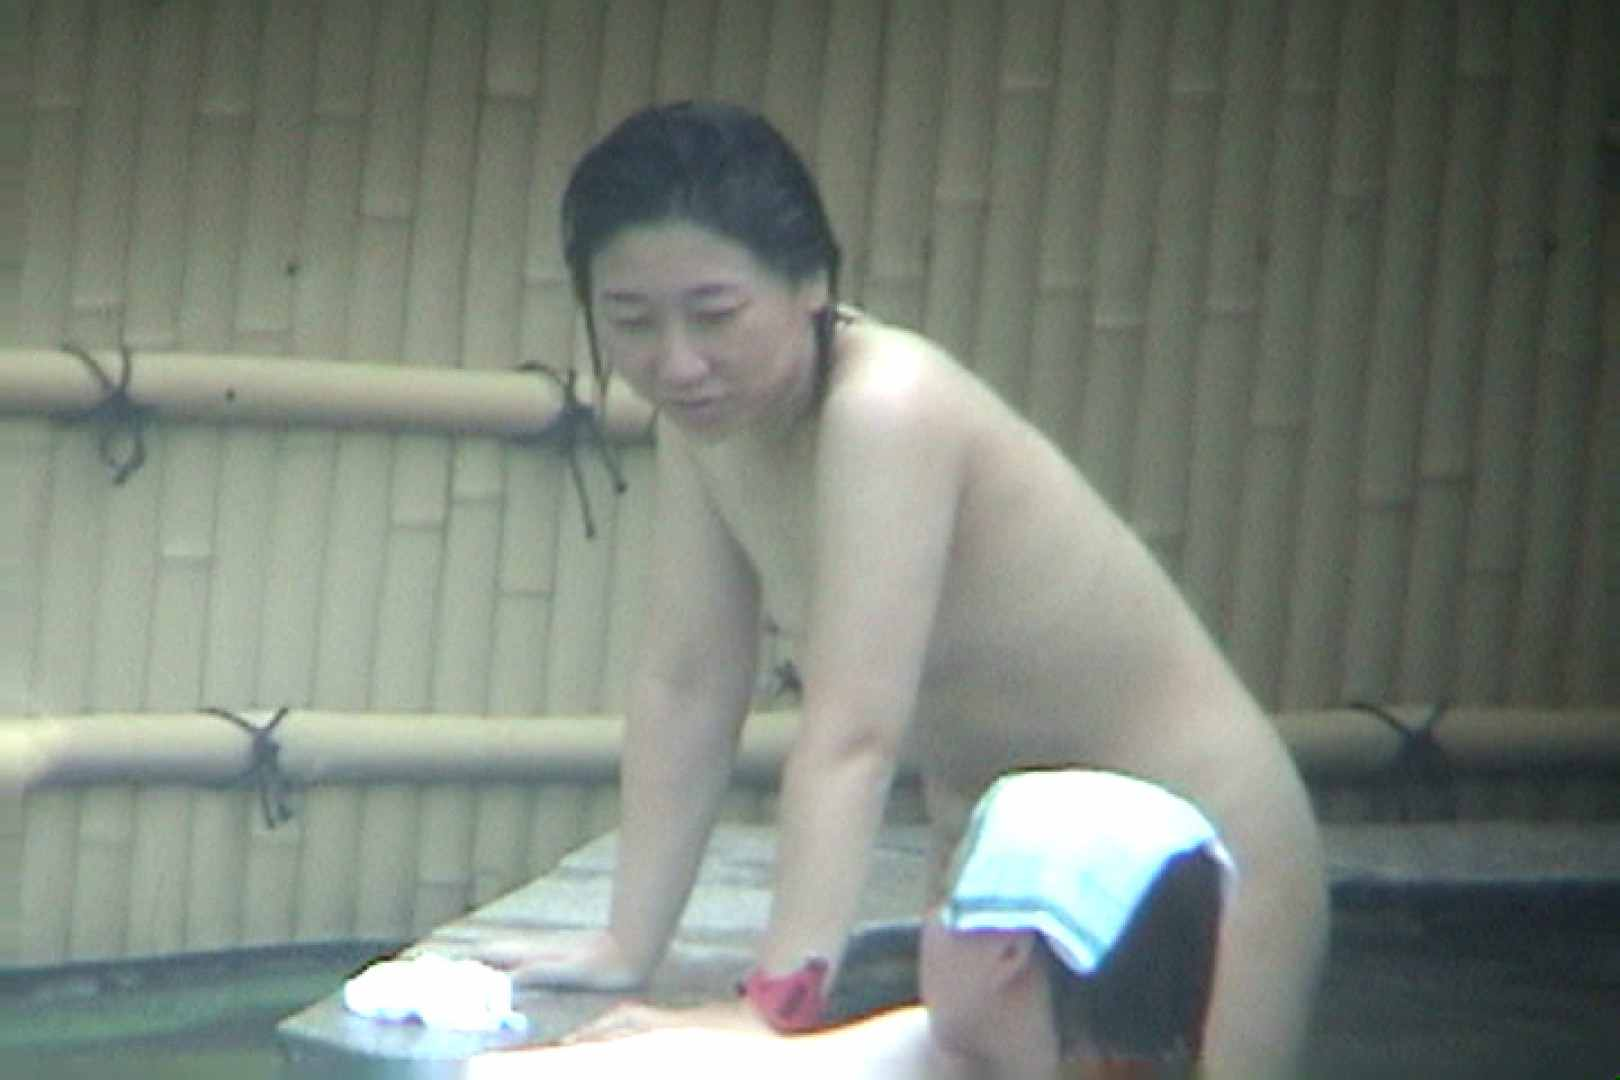 Aquaな露天風呂Vol.107 OLセックス 隠し撮りオマンコ動画紹介 63画像 2